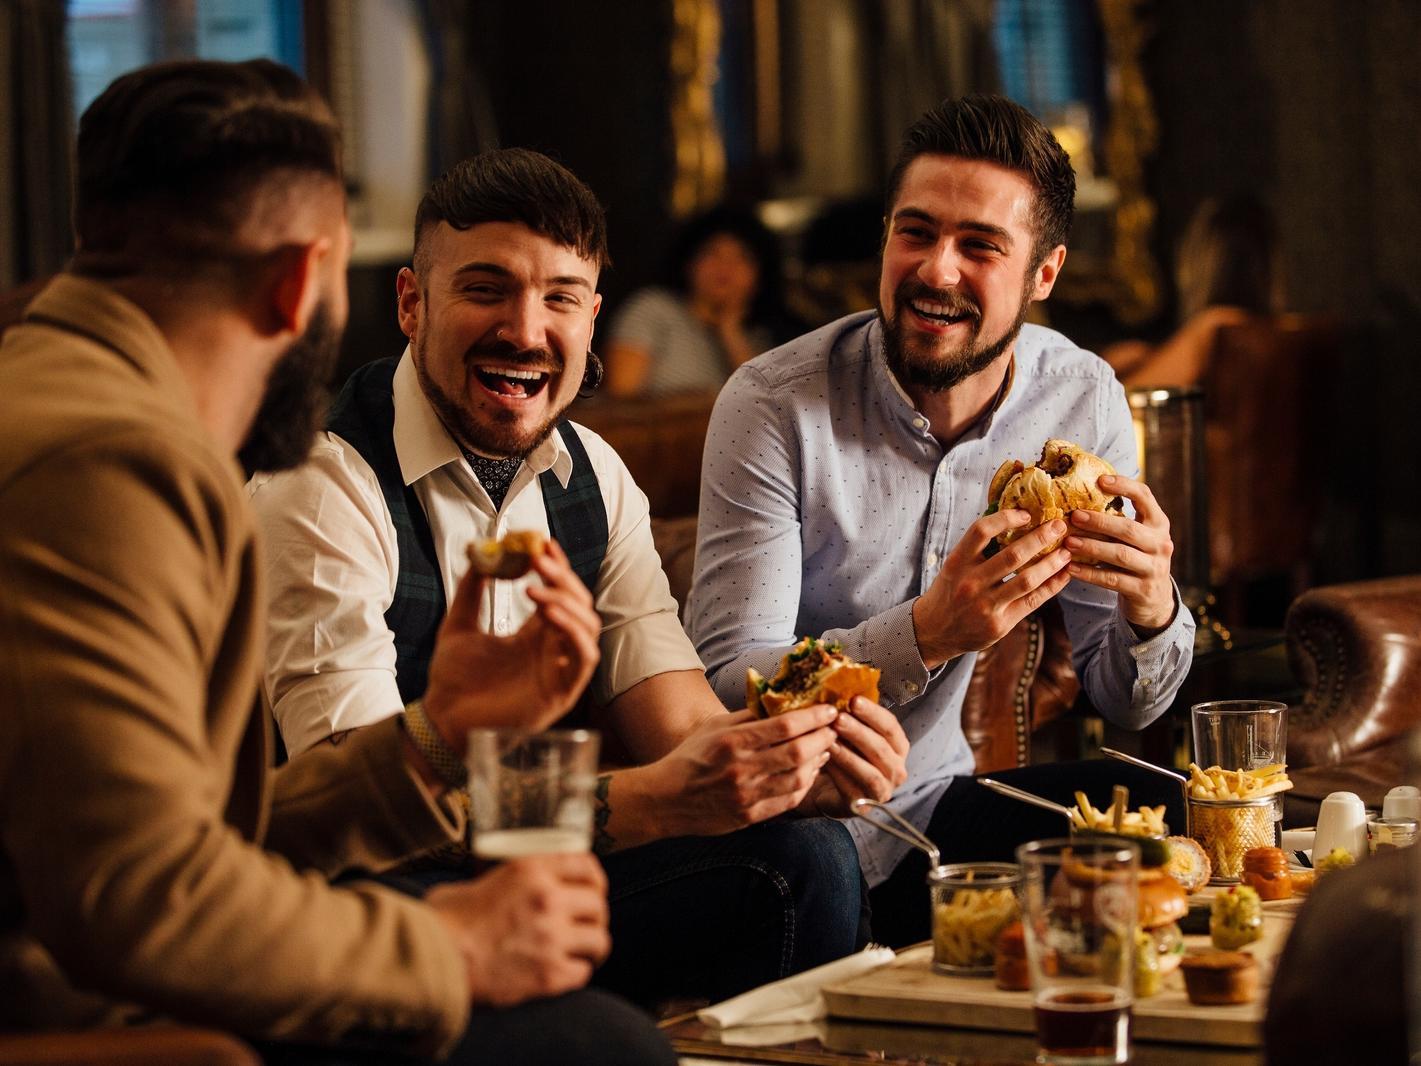 Gentlemen at a bar eating burgers.